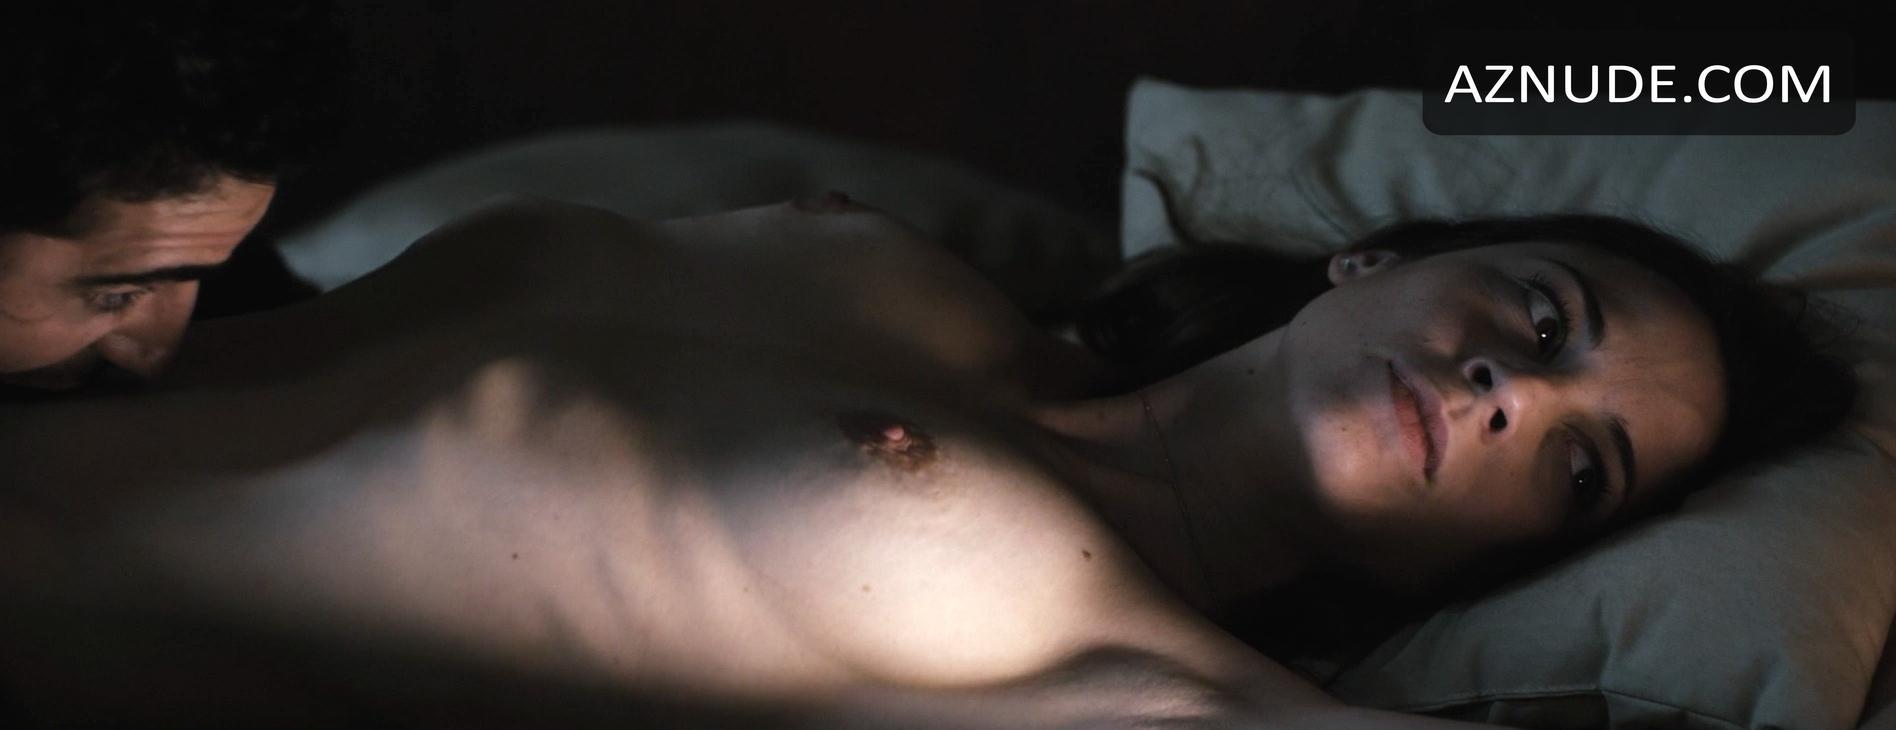 impulse sex